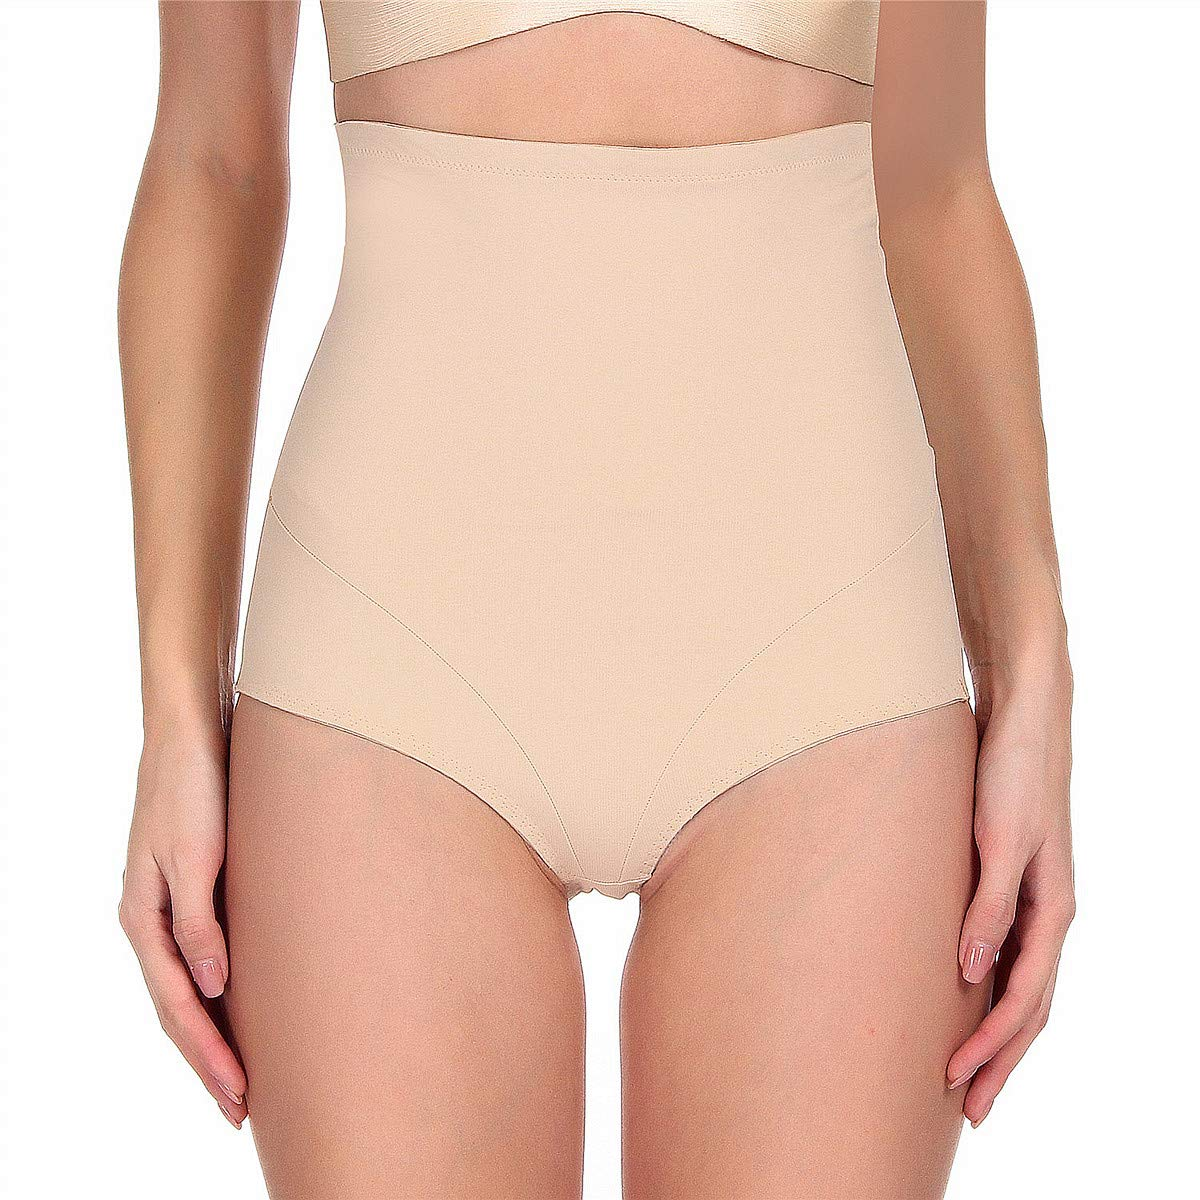 fc39ba70e Fianmy Womens Body Shaper High Waist Seamless Shapewear Butt Lifter Tummy  Control Panty Slim Waist Trainer at Amazon Women s Clothing store